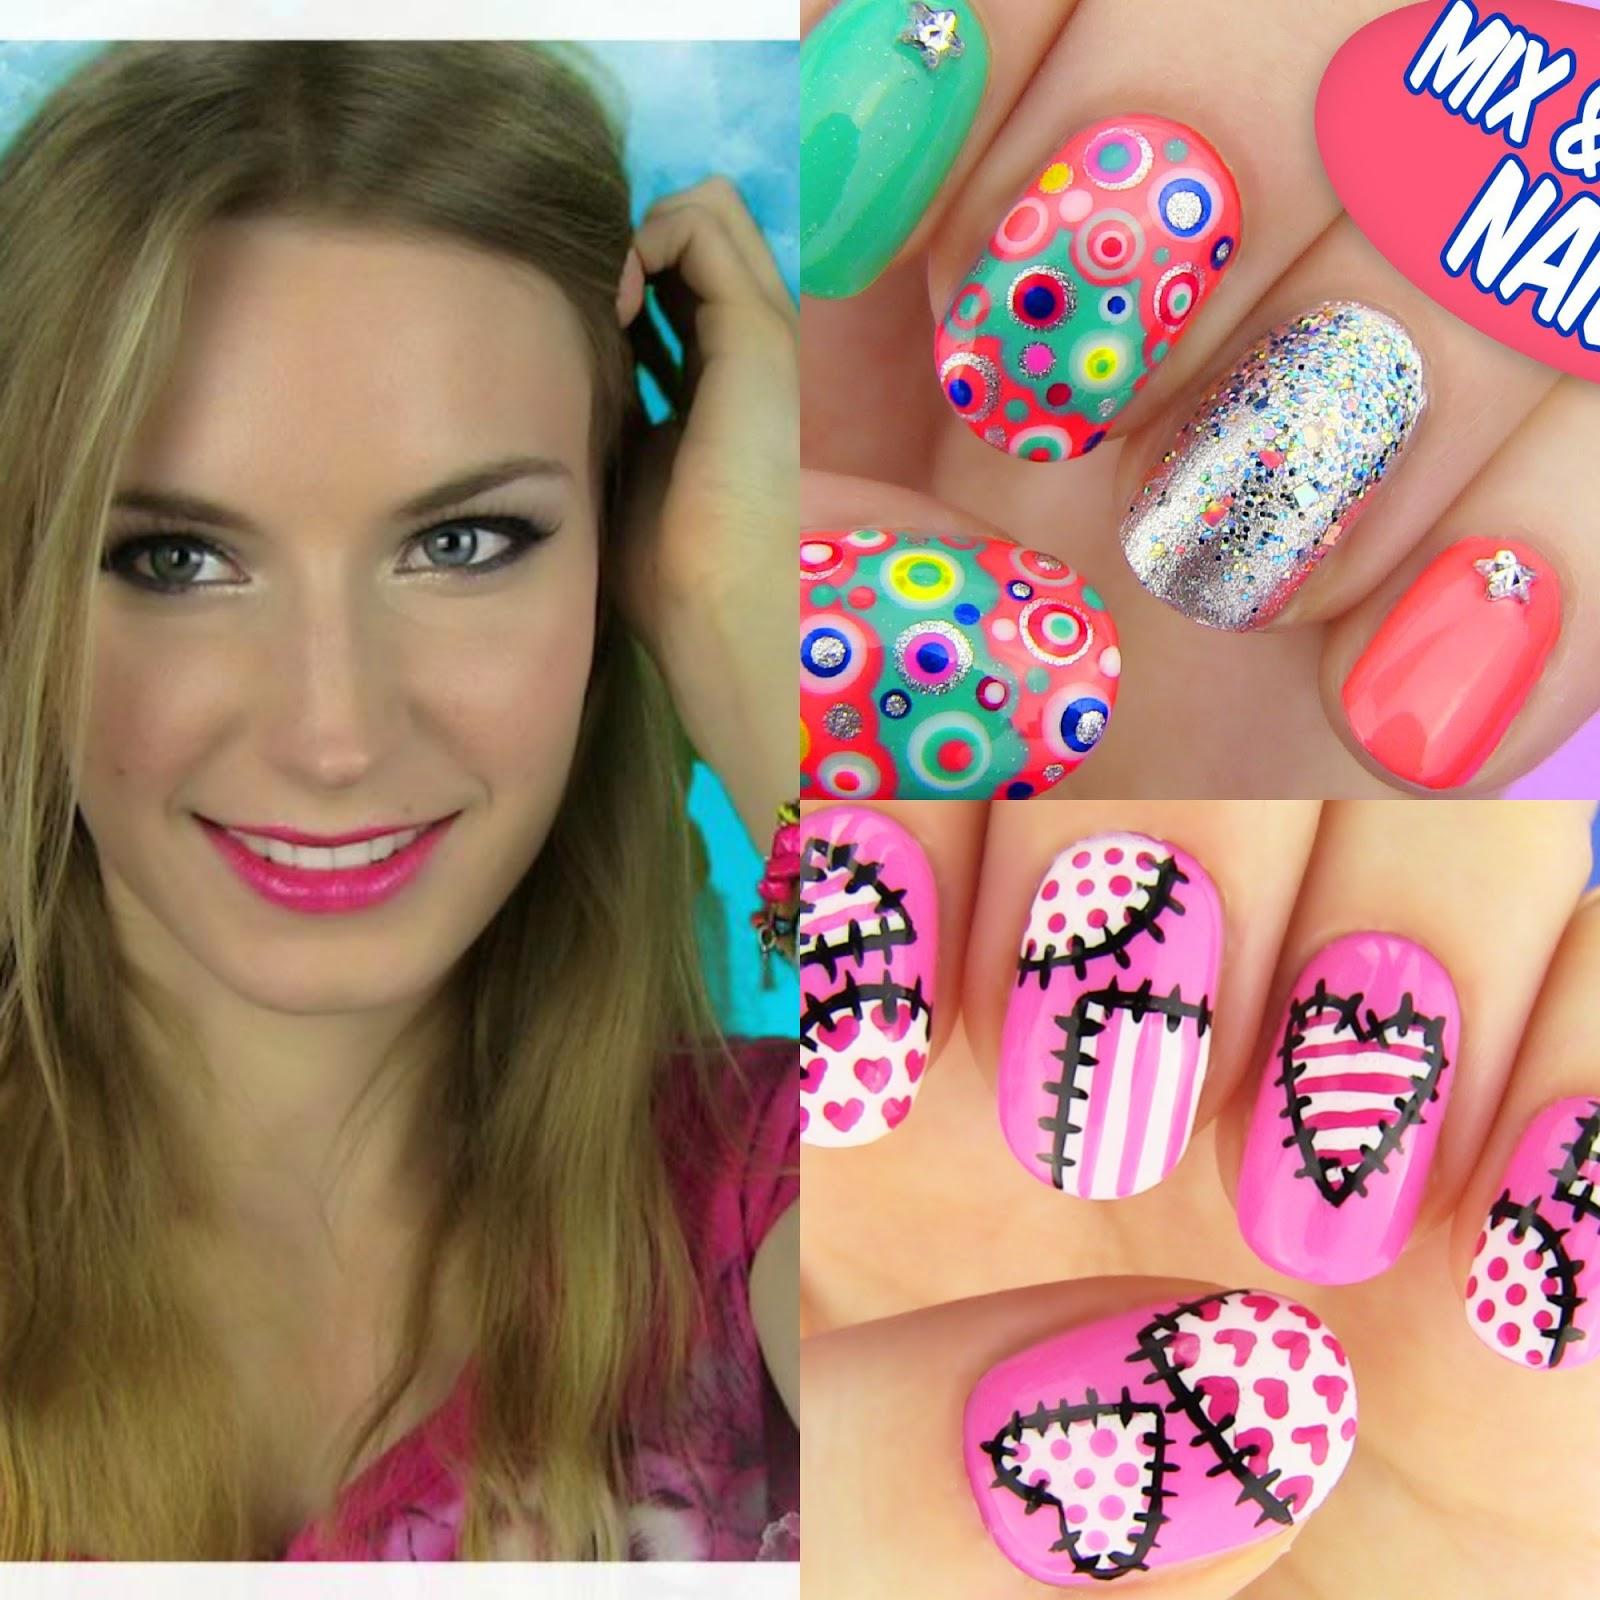 Sarabeautycorner Nail Art: Hi.Byeee: October 2014